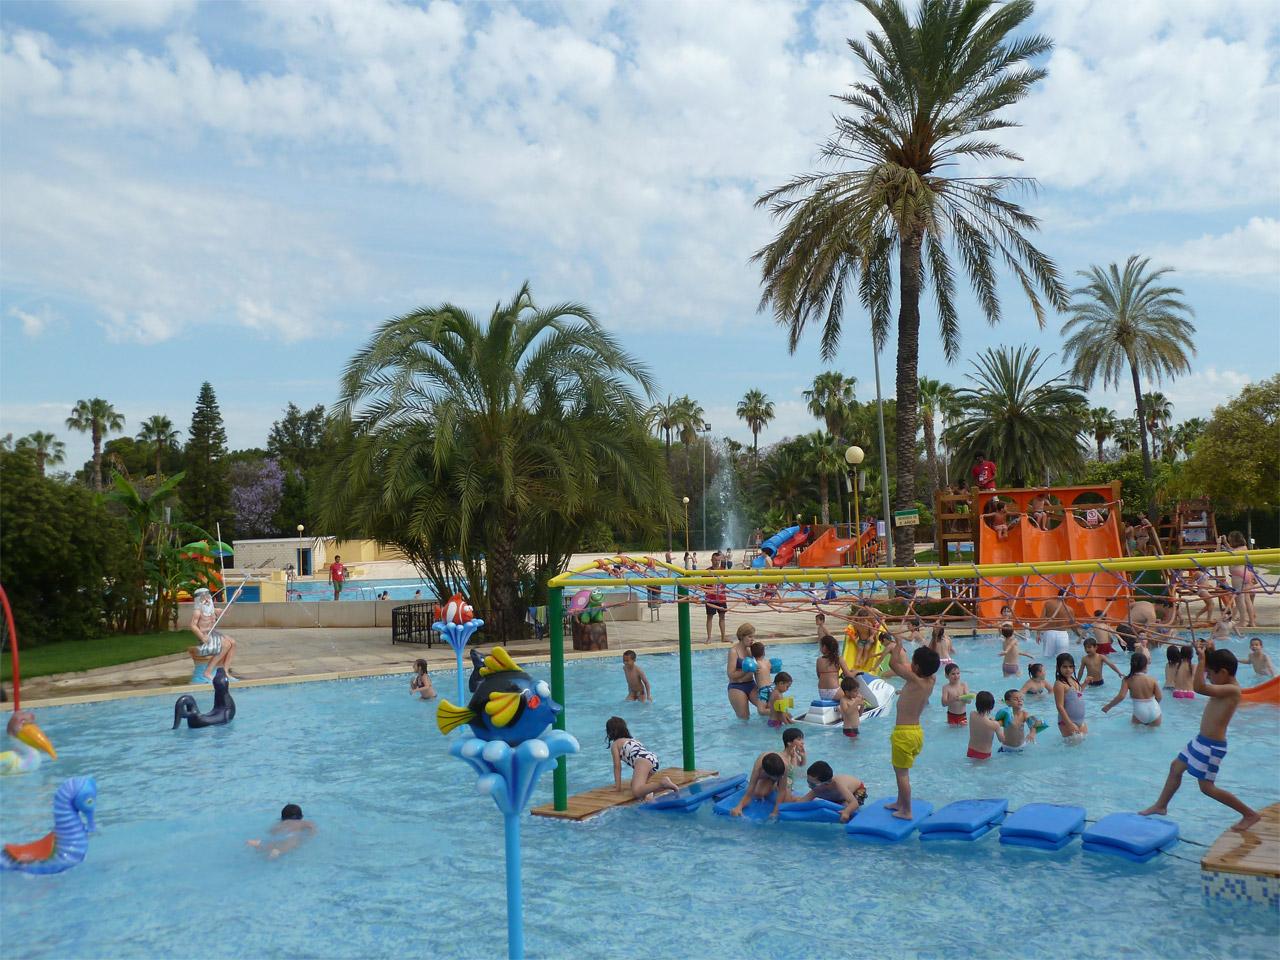 Haz deporte en verano plazas de oferta deportiva for Piscina de aldaia